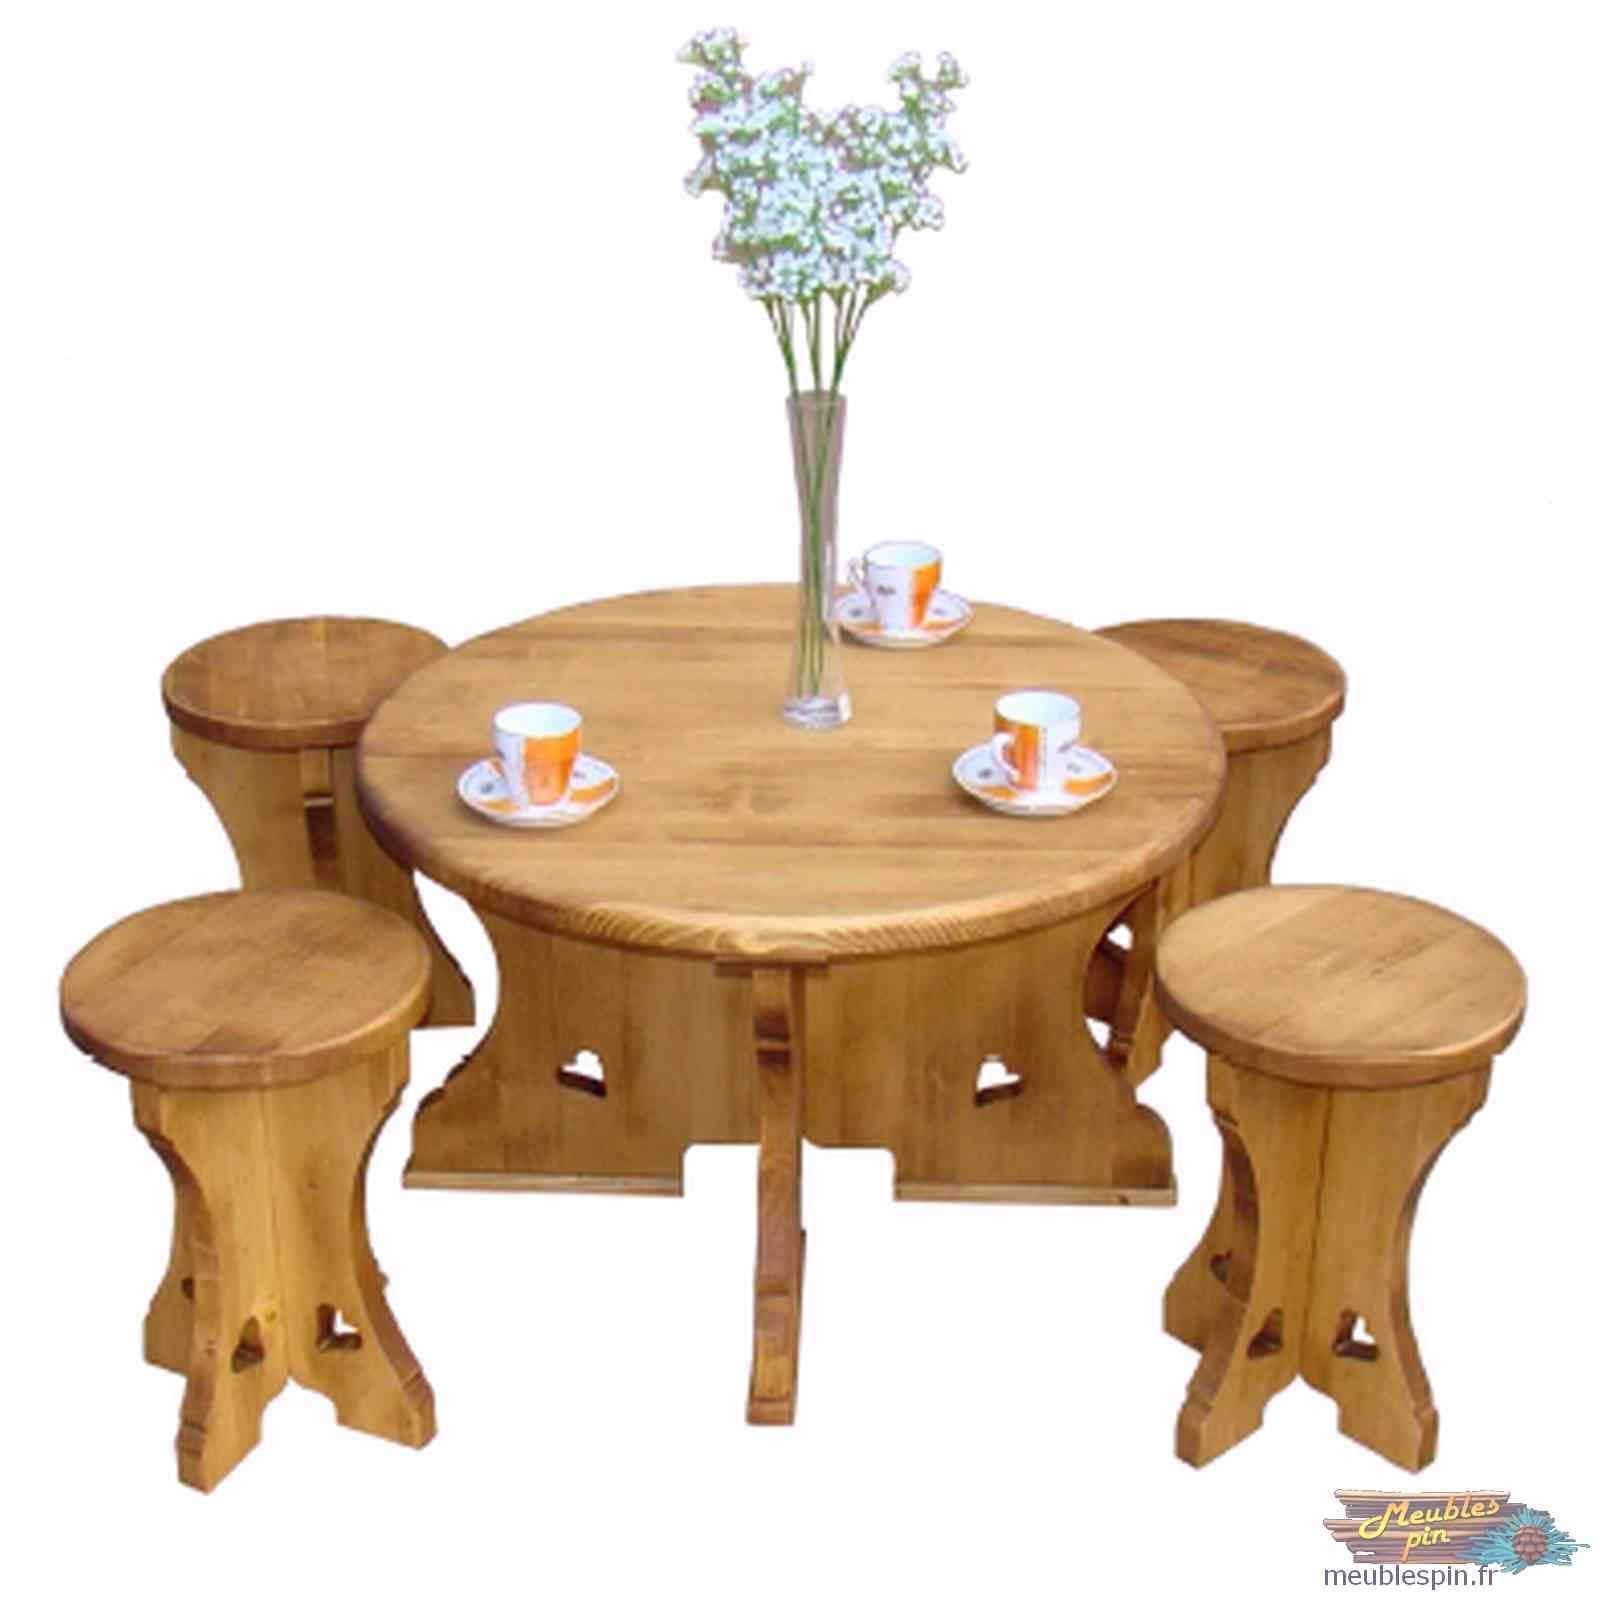 Table Basse Ronde En Pin Style Montagnard Meublespin Fr Table Basse Ronde Table Basse En Pin Table Basse